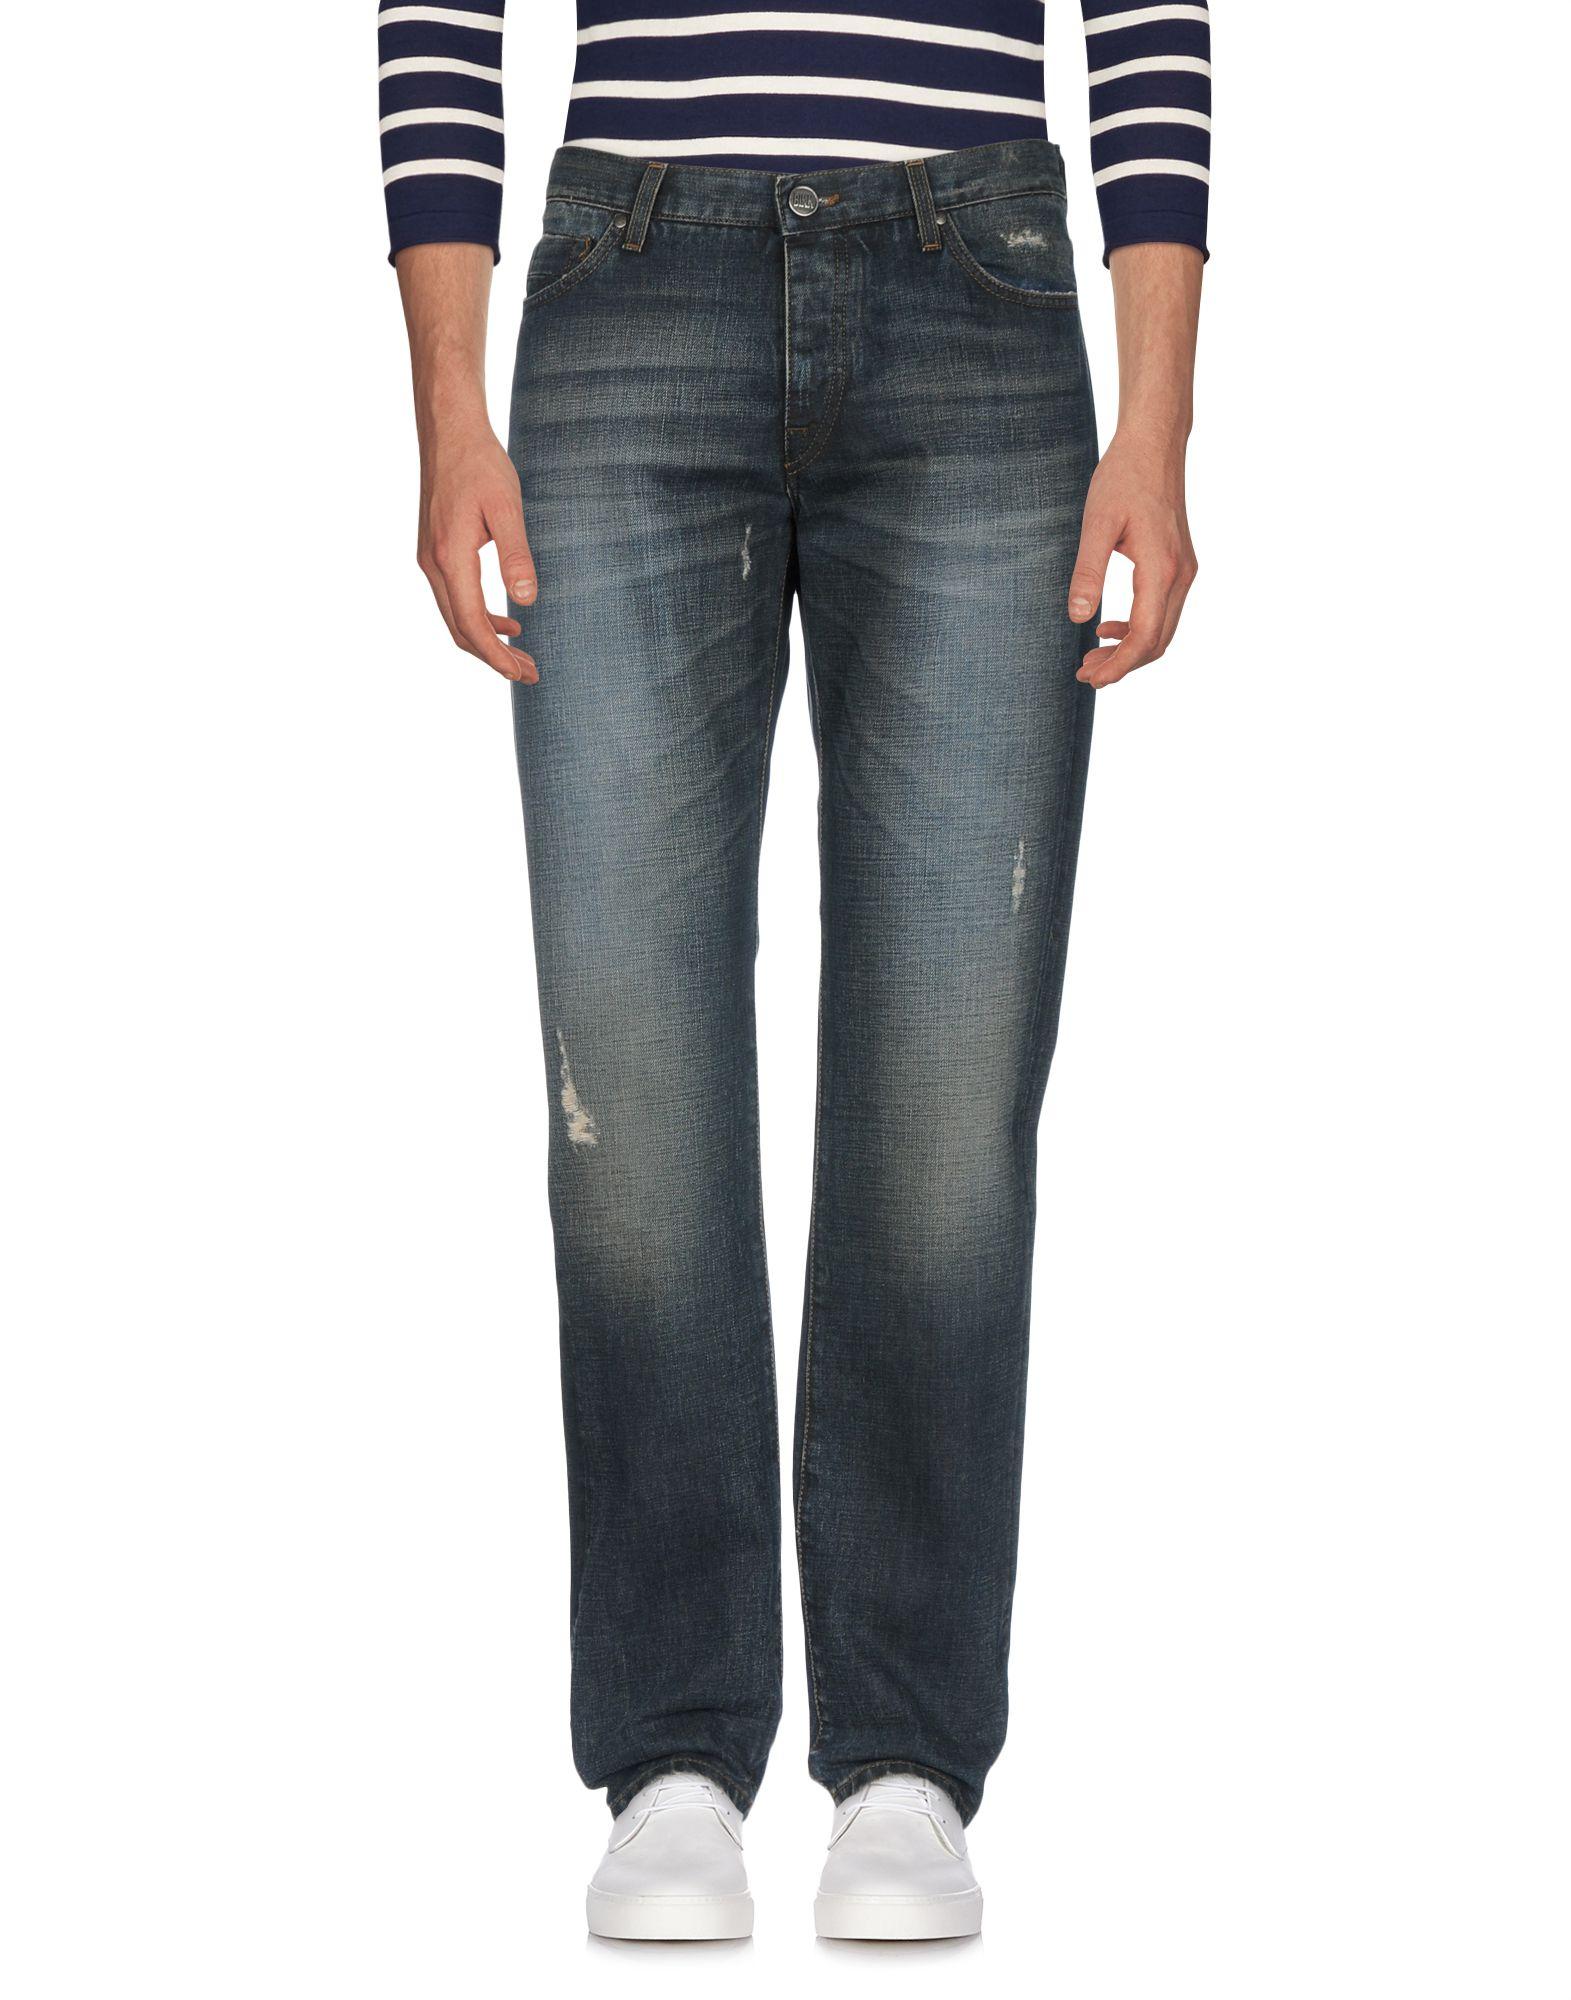 Pantaloni Jeans Bikkembergs Donna - Acquista online su